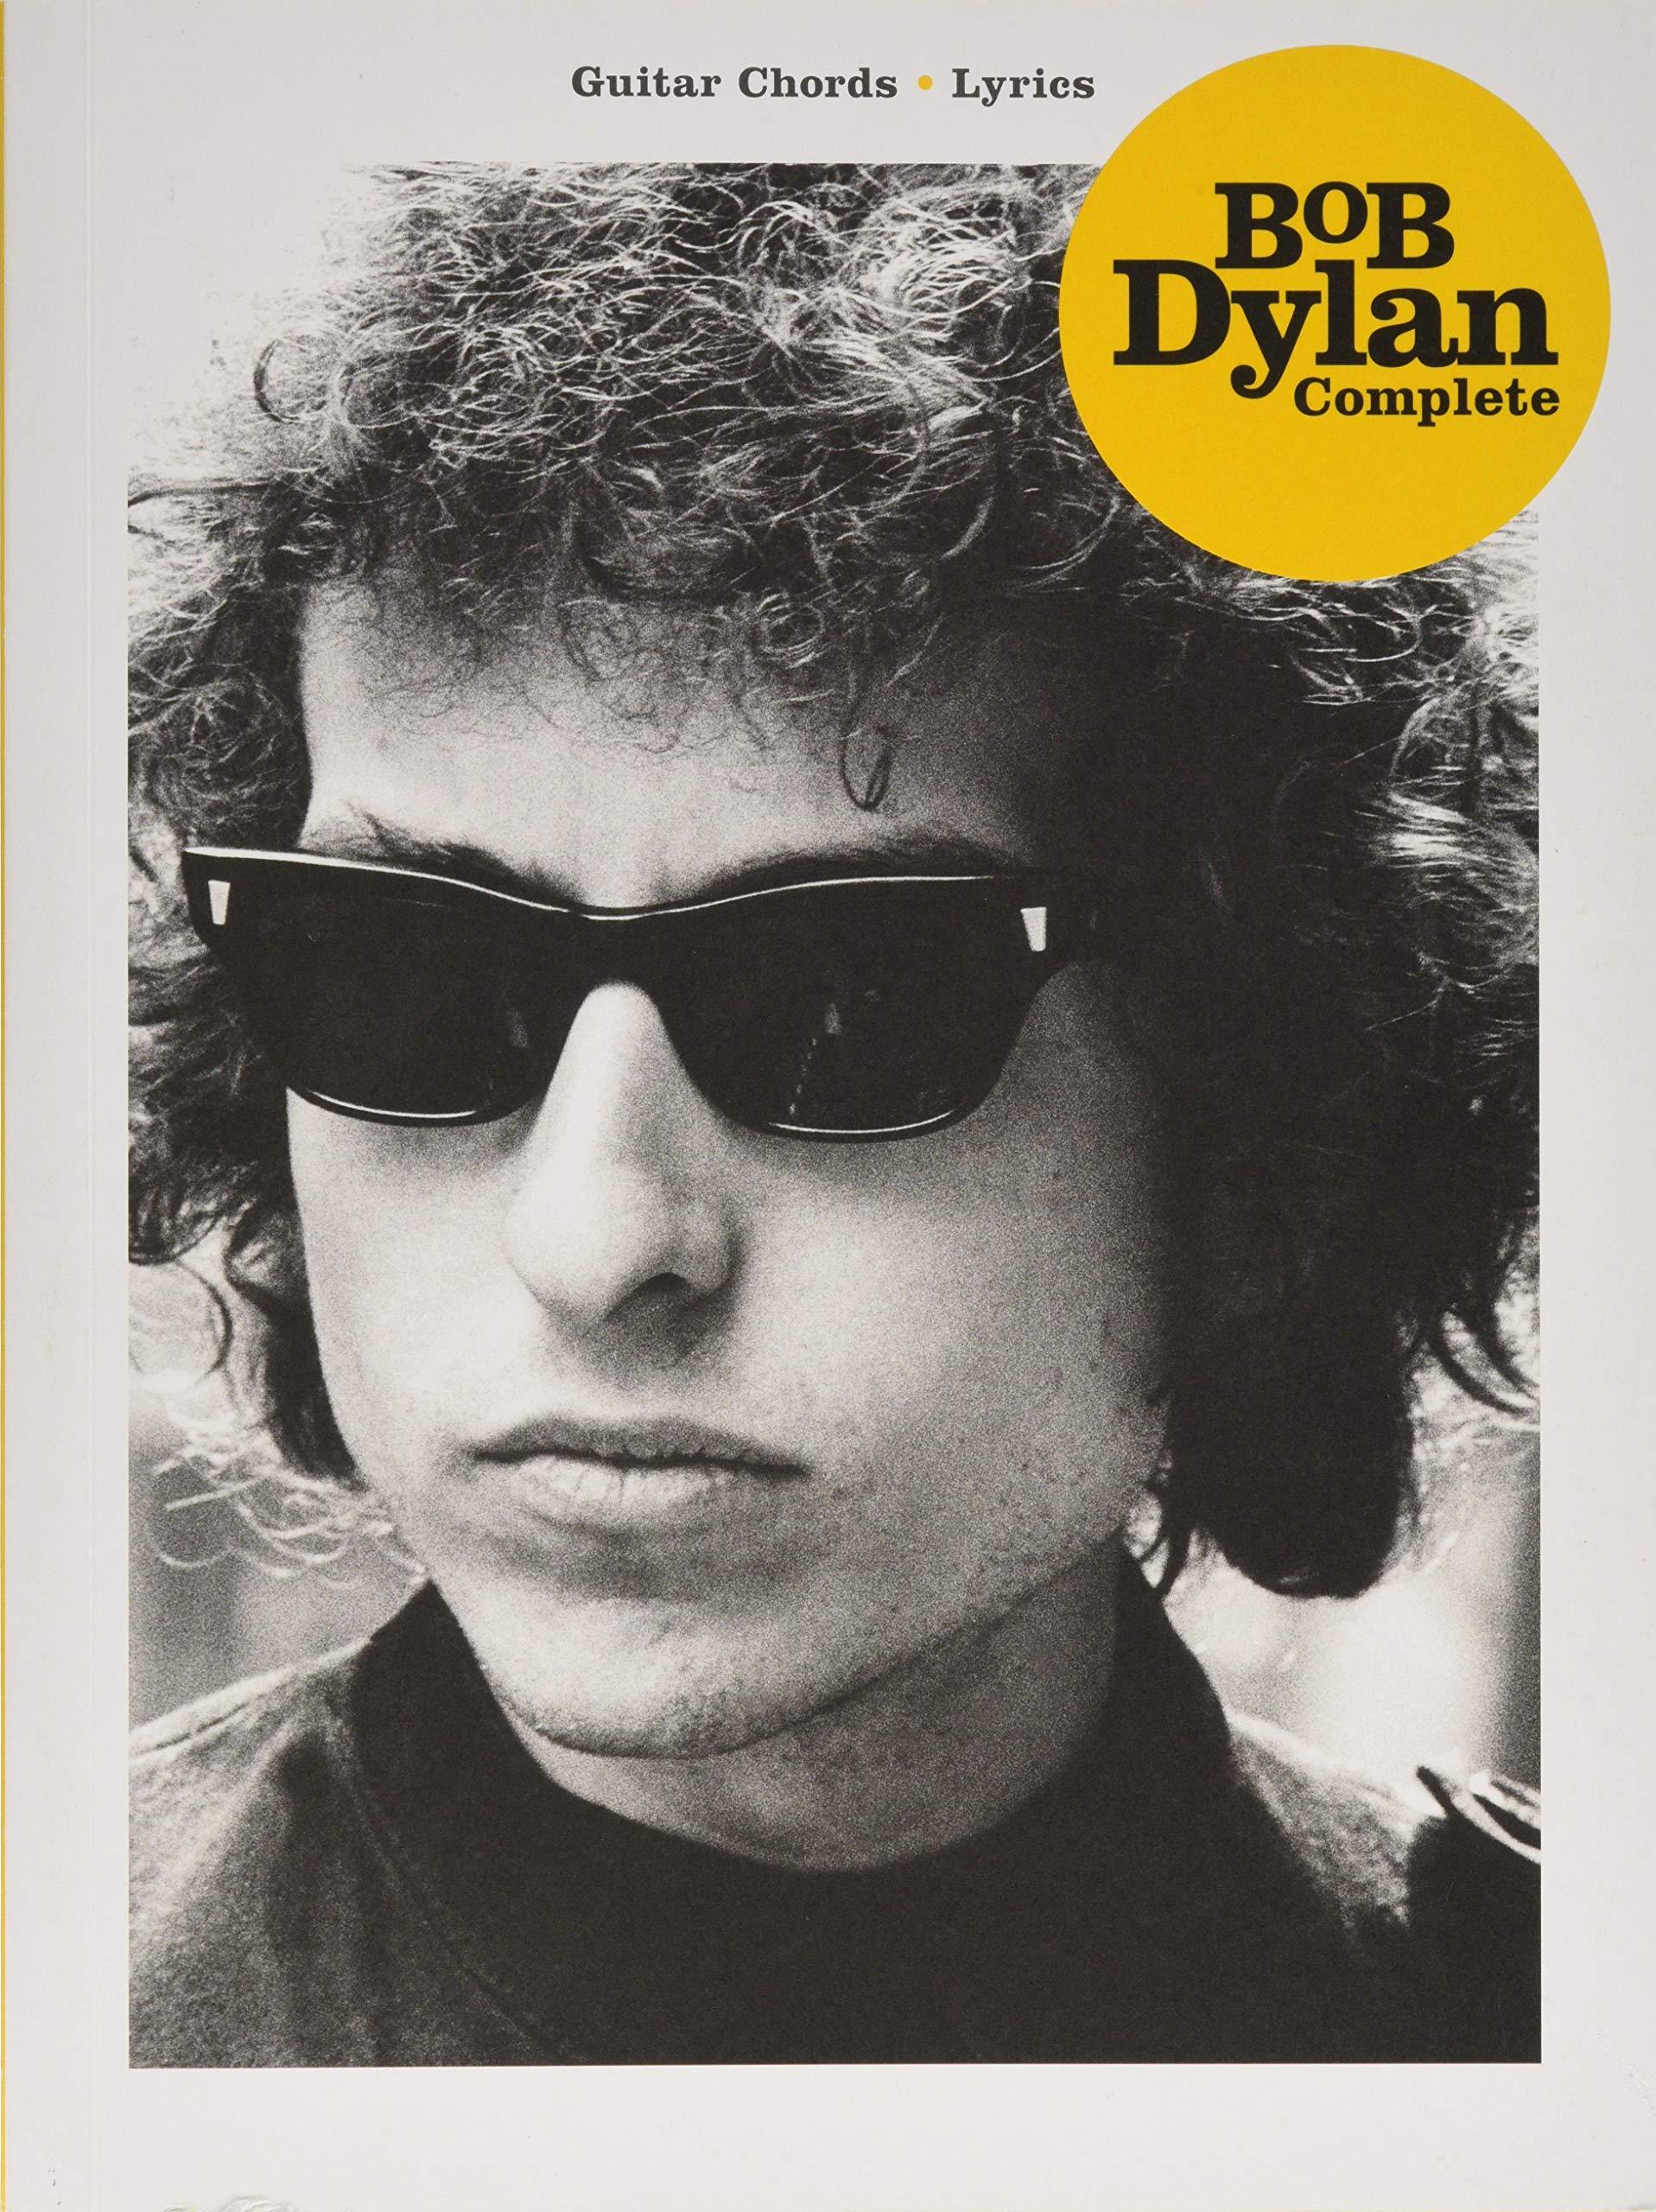 Bob Dylan Complete (Guitar Chords, Lyrics) by Hal Leonard